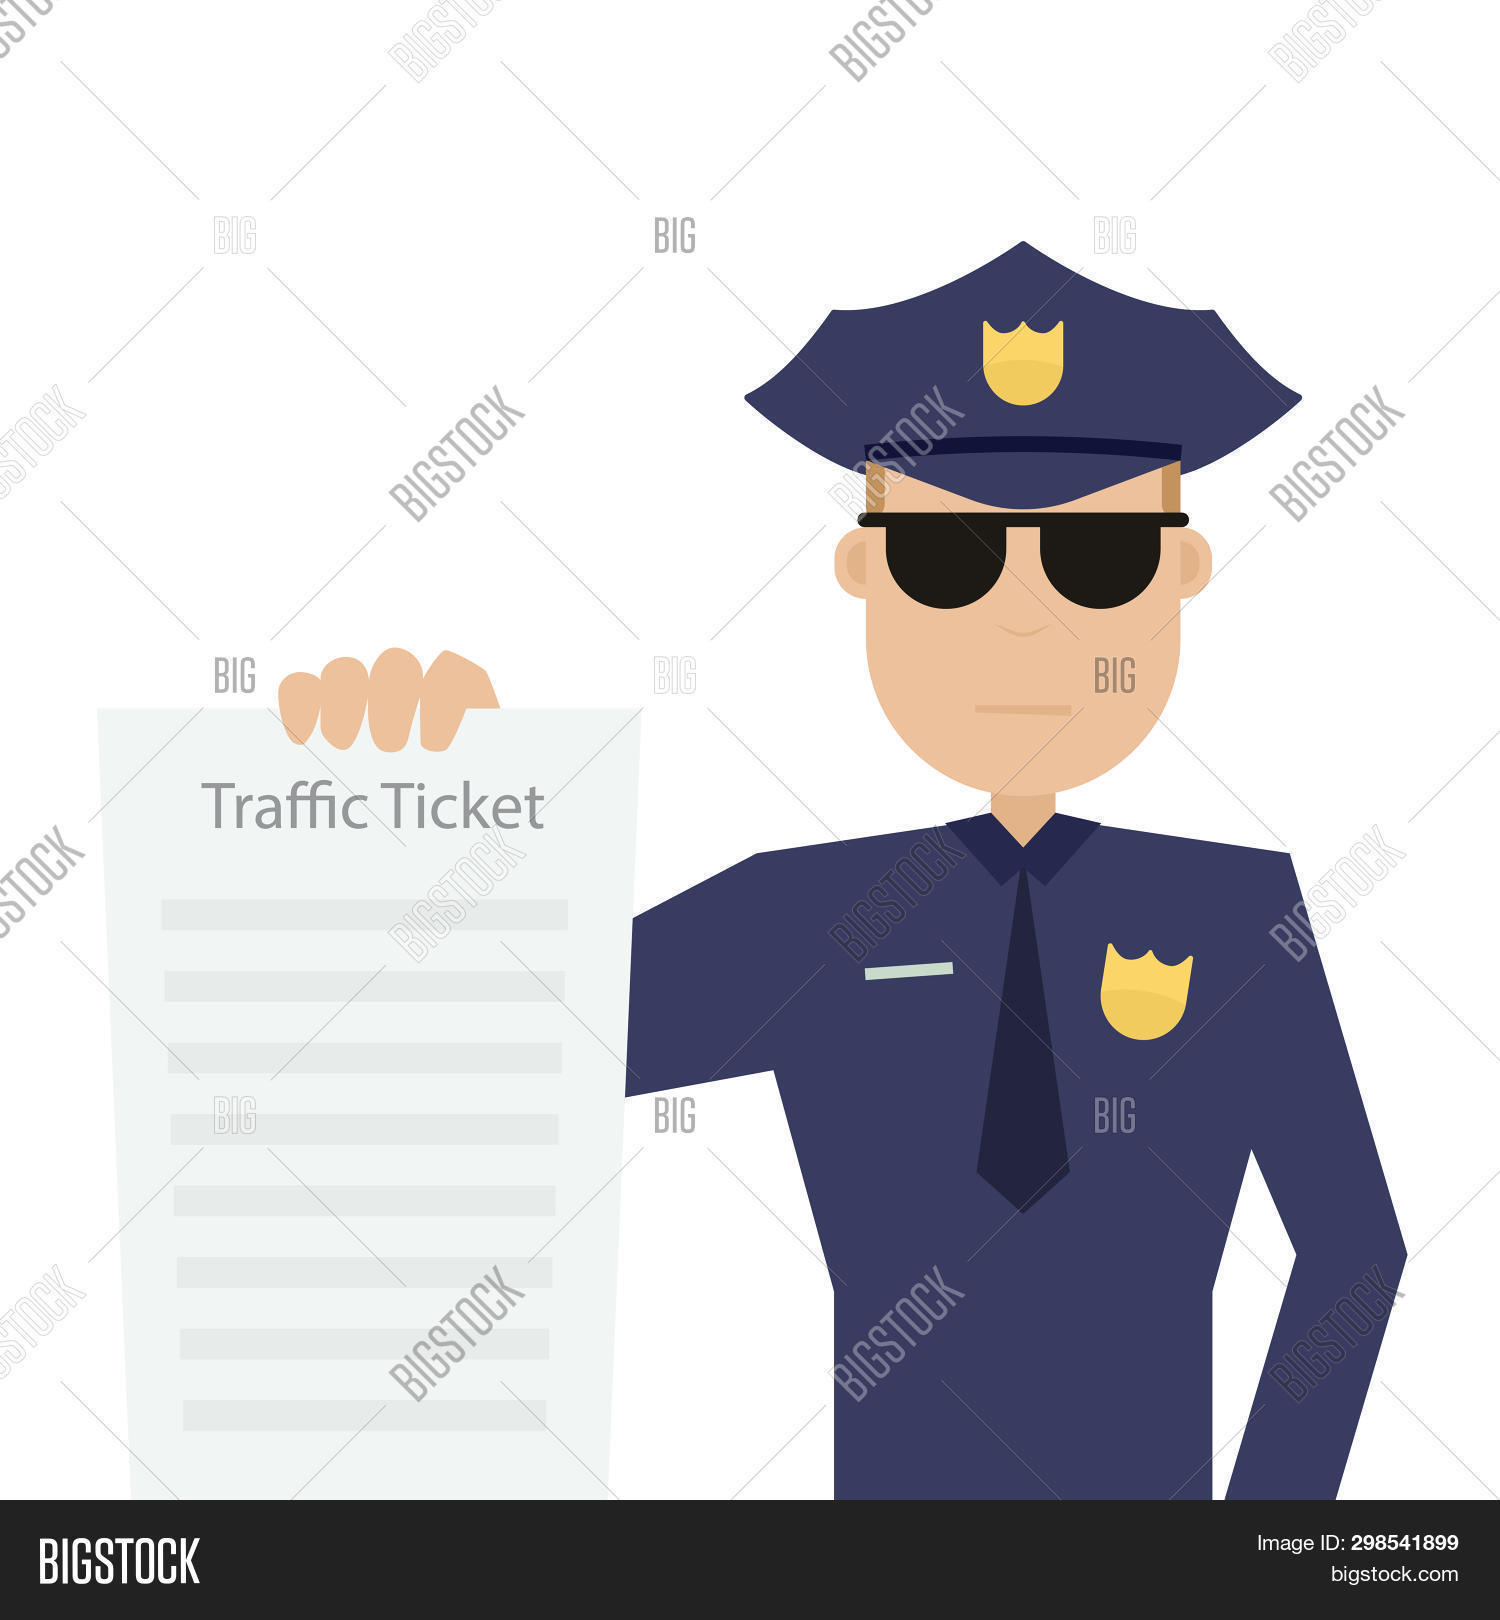 Road Patrol Officer Image & Photo (Free Trial) | Bigstock